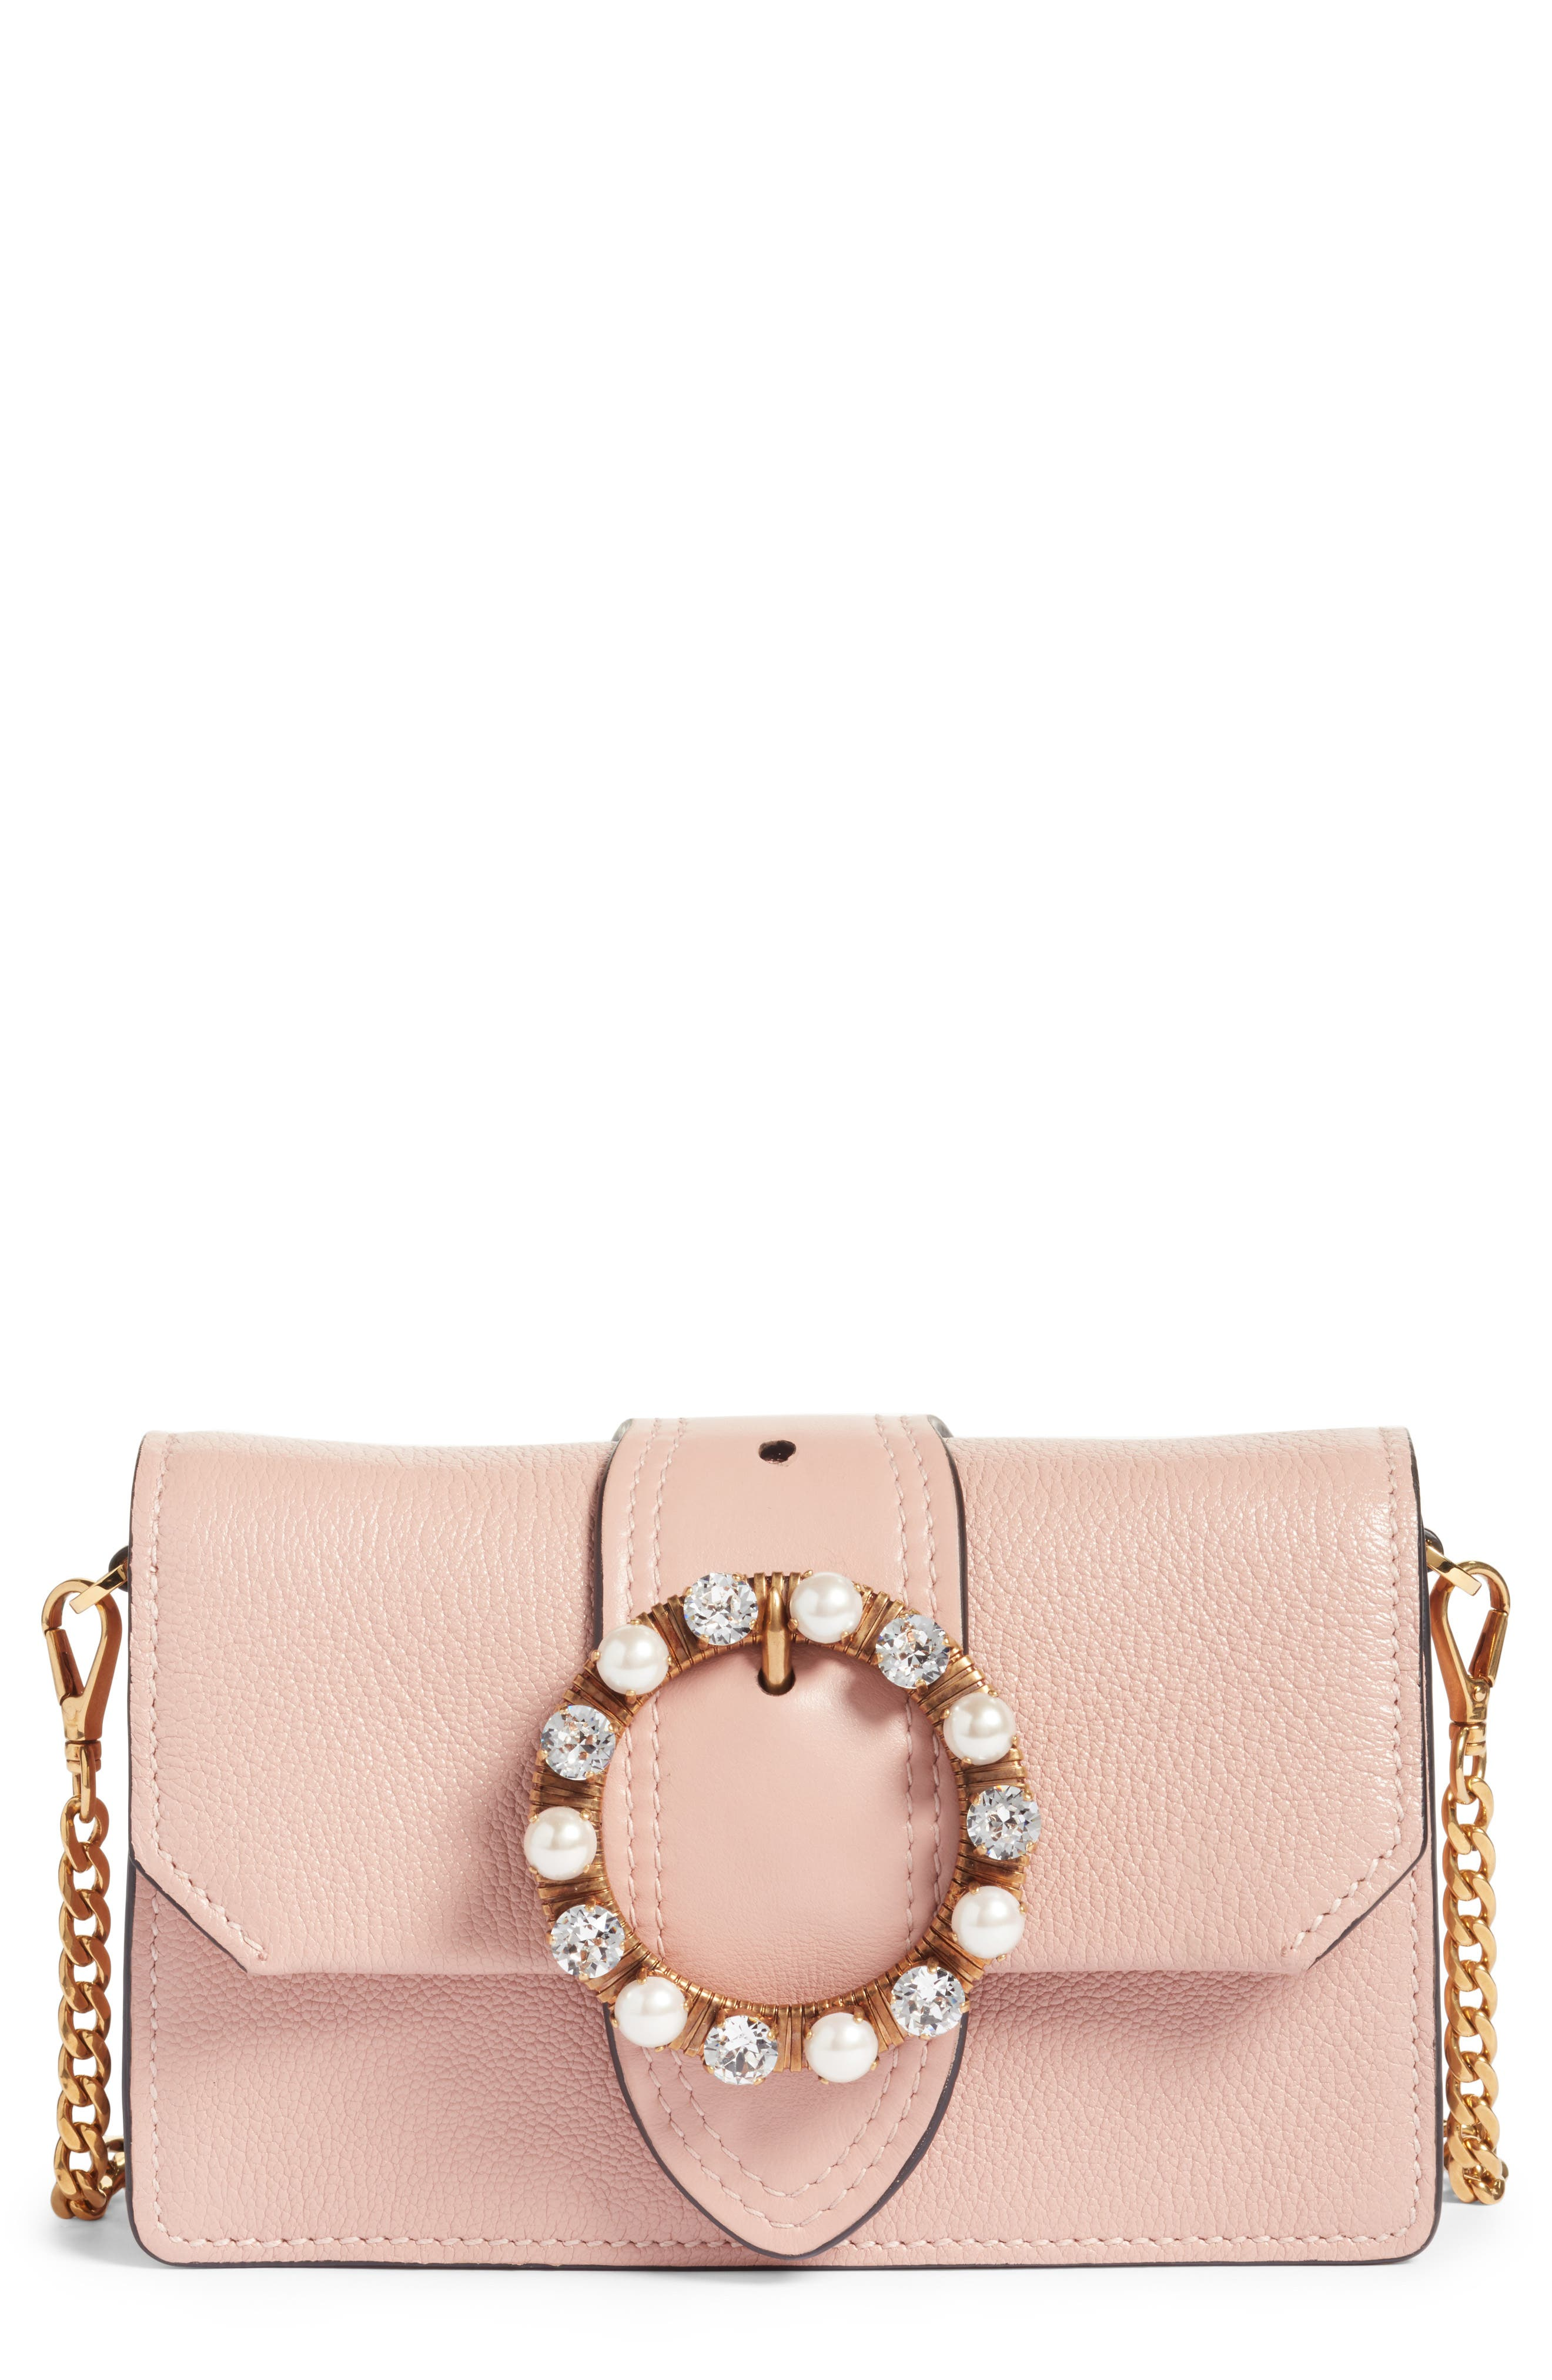 Miu Miu Lady Madras Crystal Embellished Leather Crossbody Bag